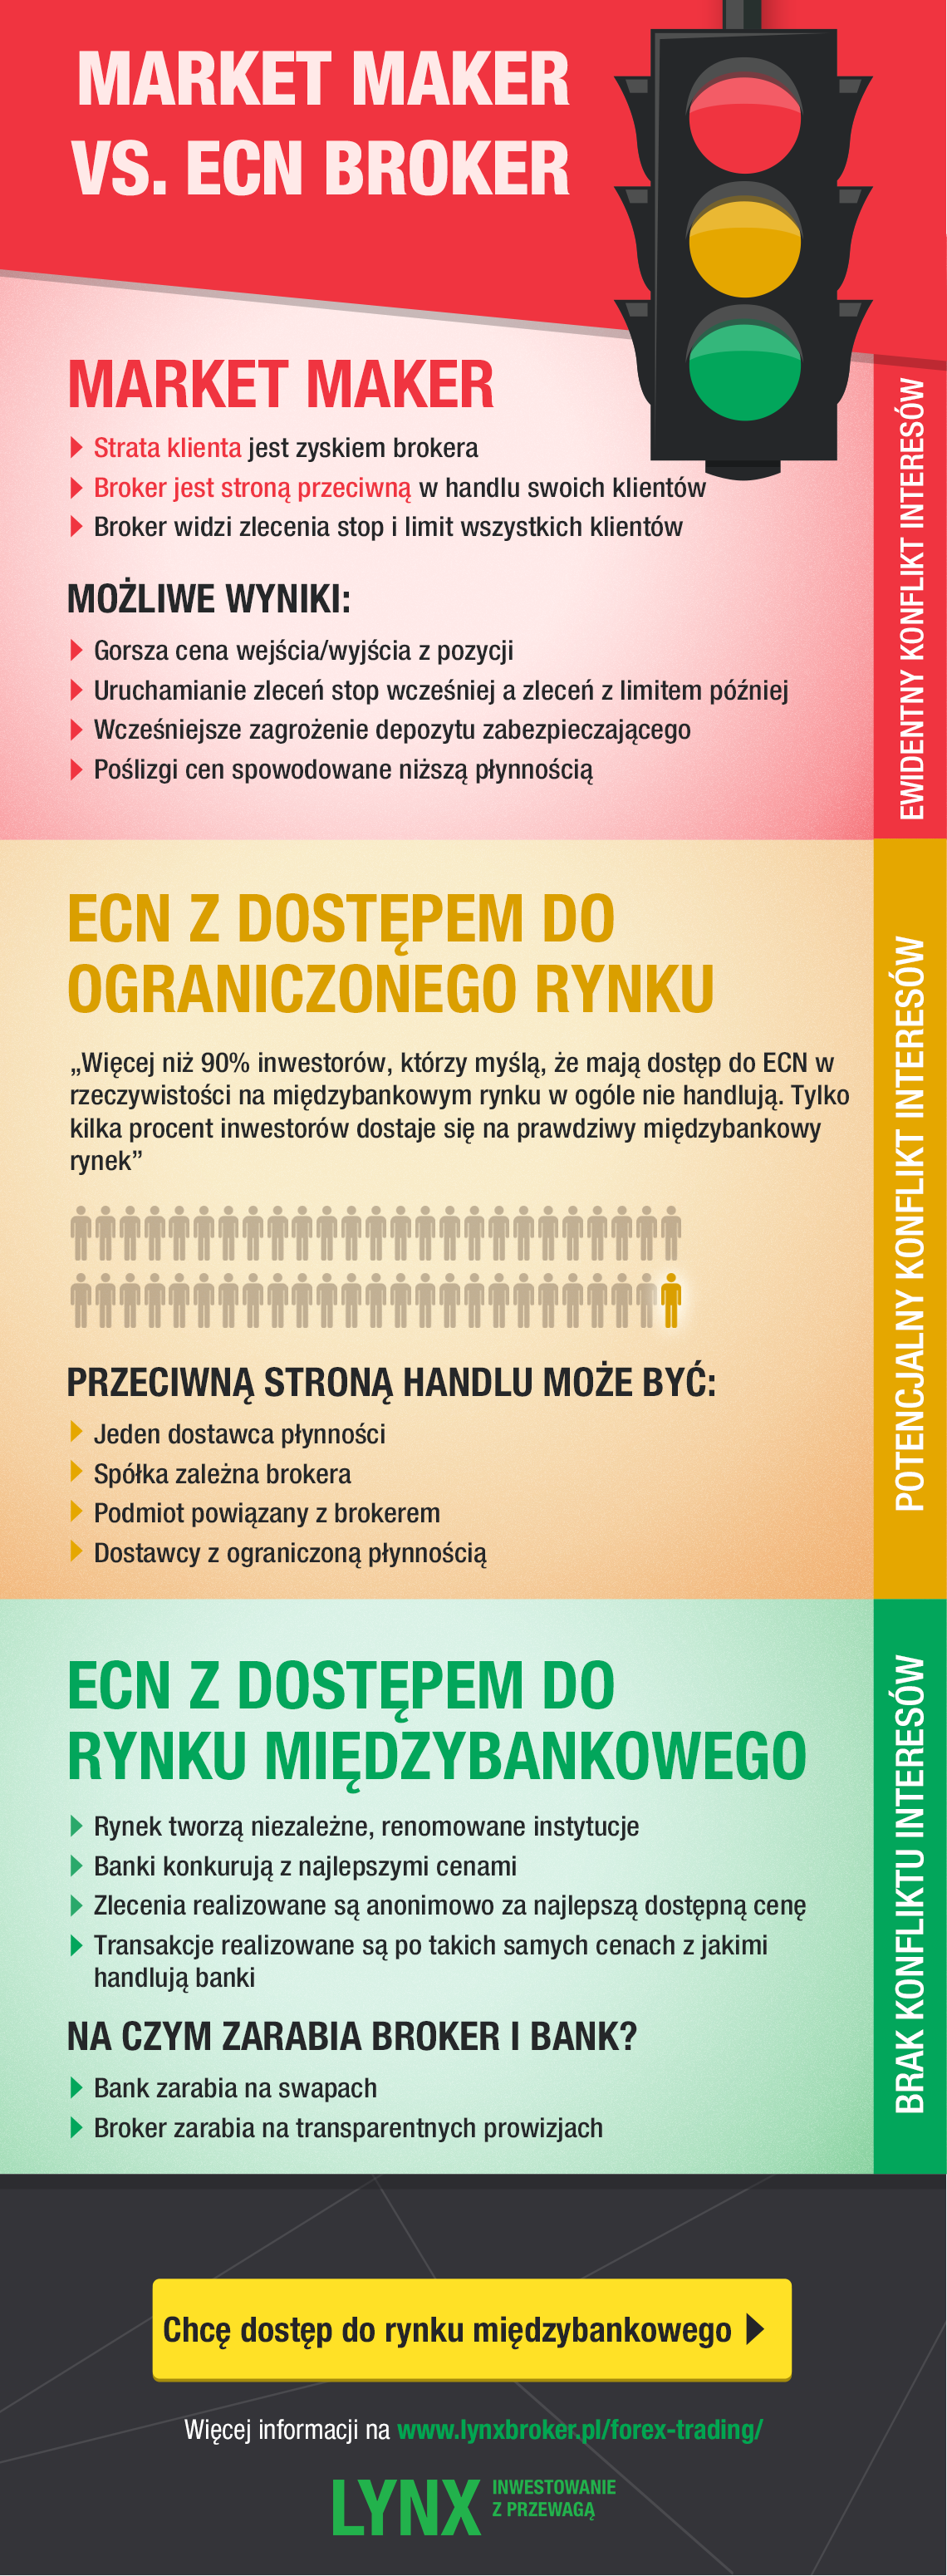 market maker ecn forex